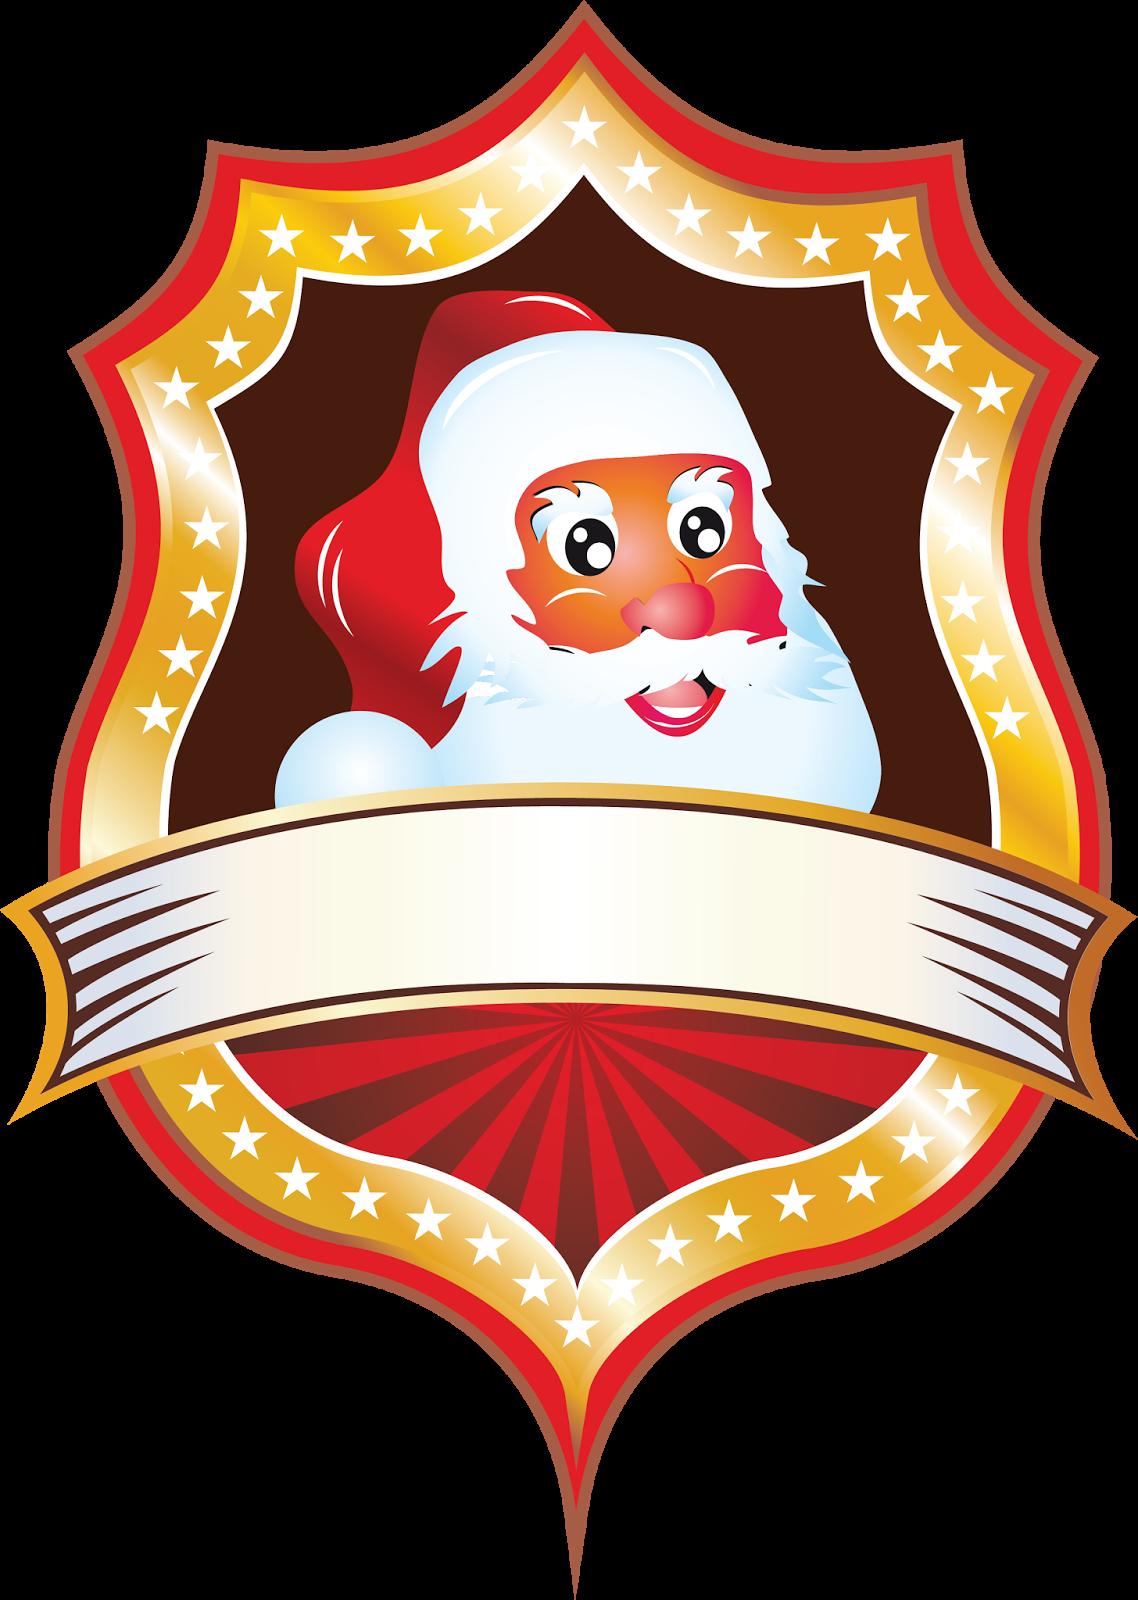 clip transparent download Charlotte's web characters clipart. Christmas santa clip art